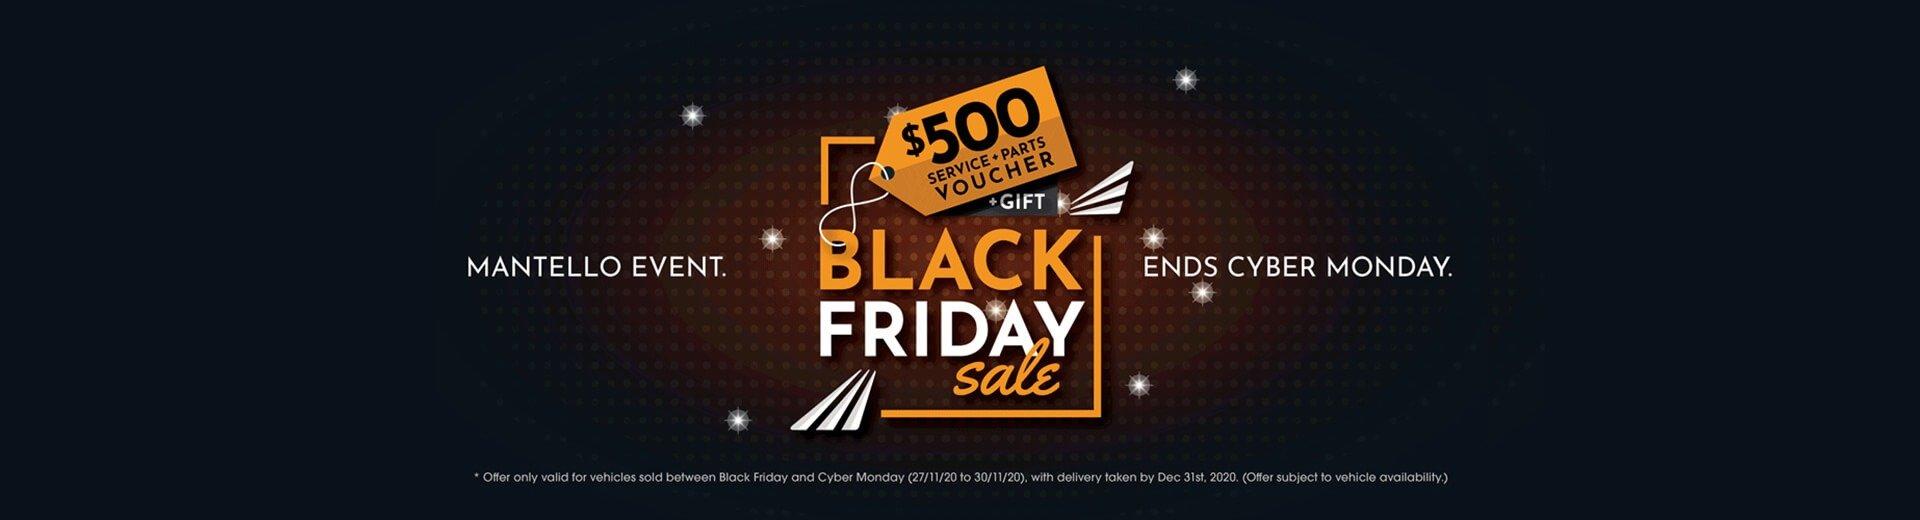 Mantello Motor Group - Black Friday Sale